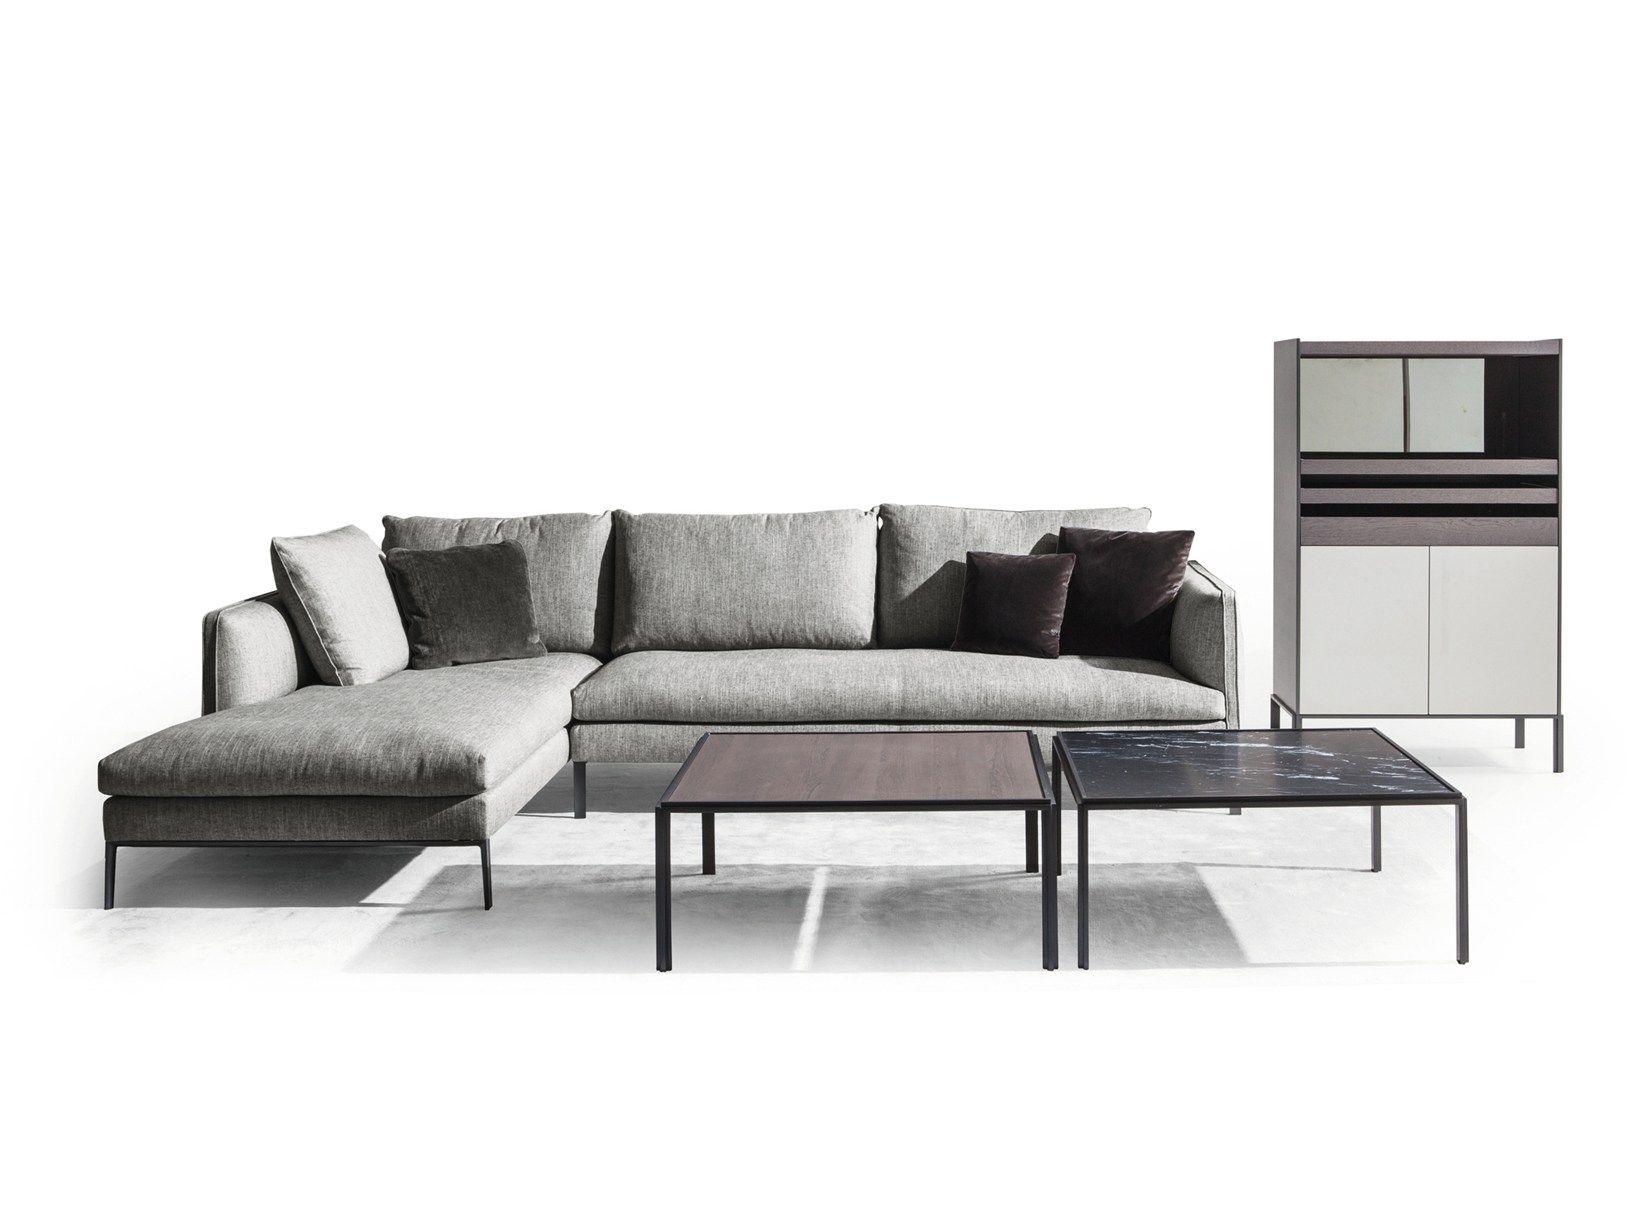 van duysen nordic rigor mediterranean flavor. Black Bedroom Furniture Sets. Home Design Ideas